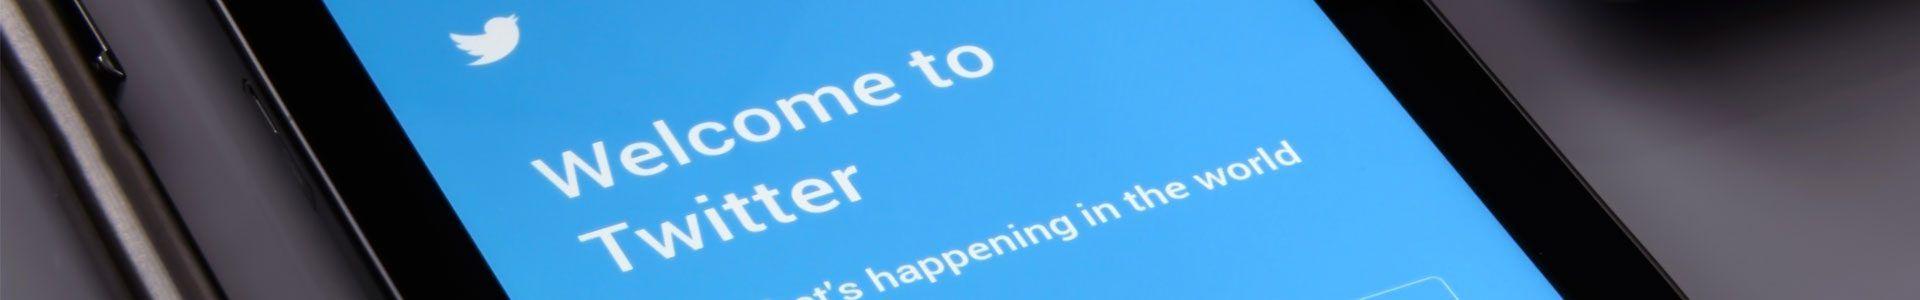 3 toepassingen voor social mediamonitoring